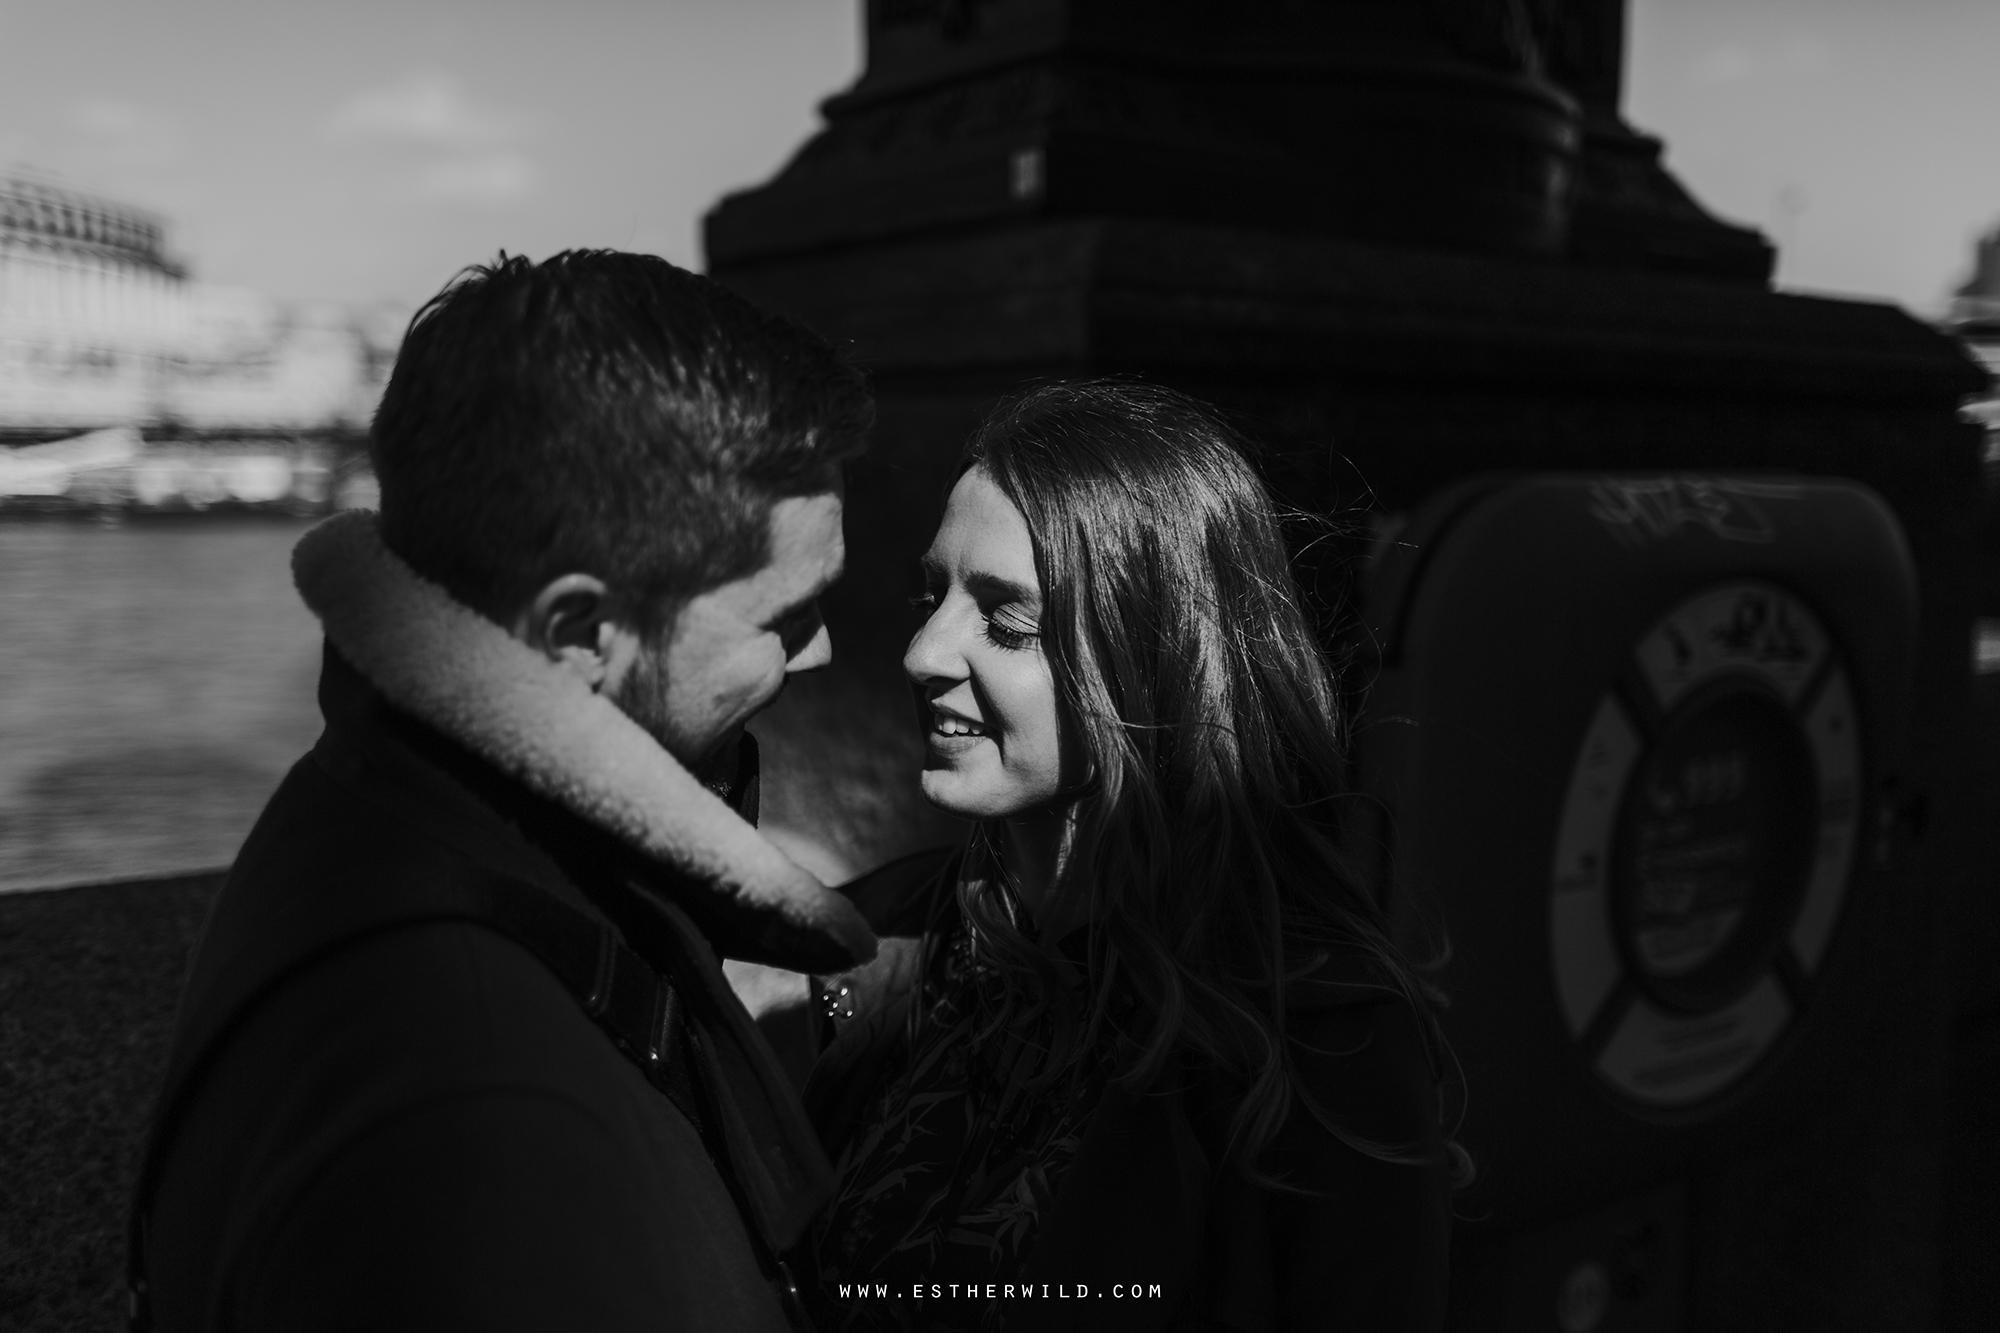 London_Engagement_Session_Pre-Wedding_Photo_Shoot_Esther_Wild_Photographer_IMG_0748_Z72A0229.jpg